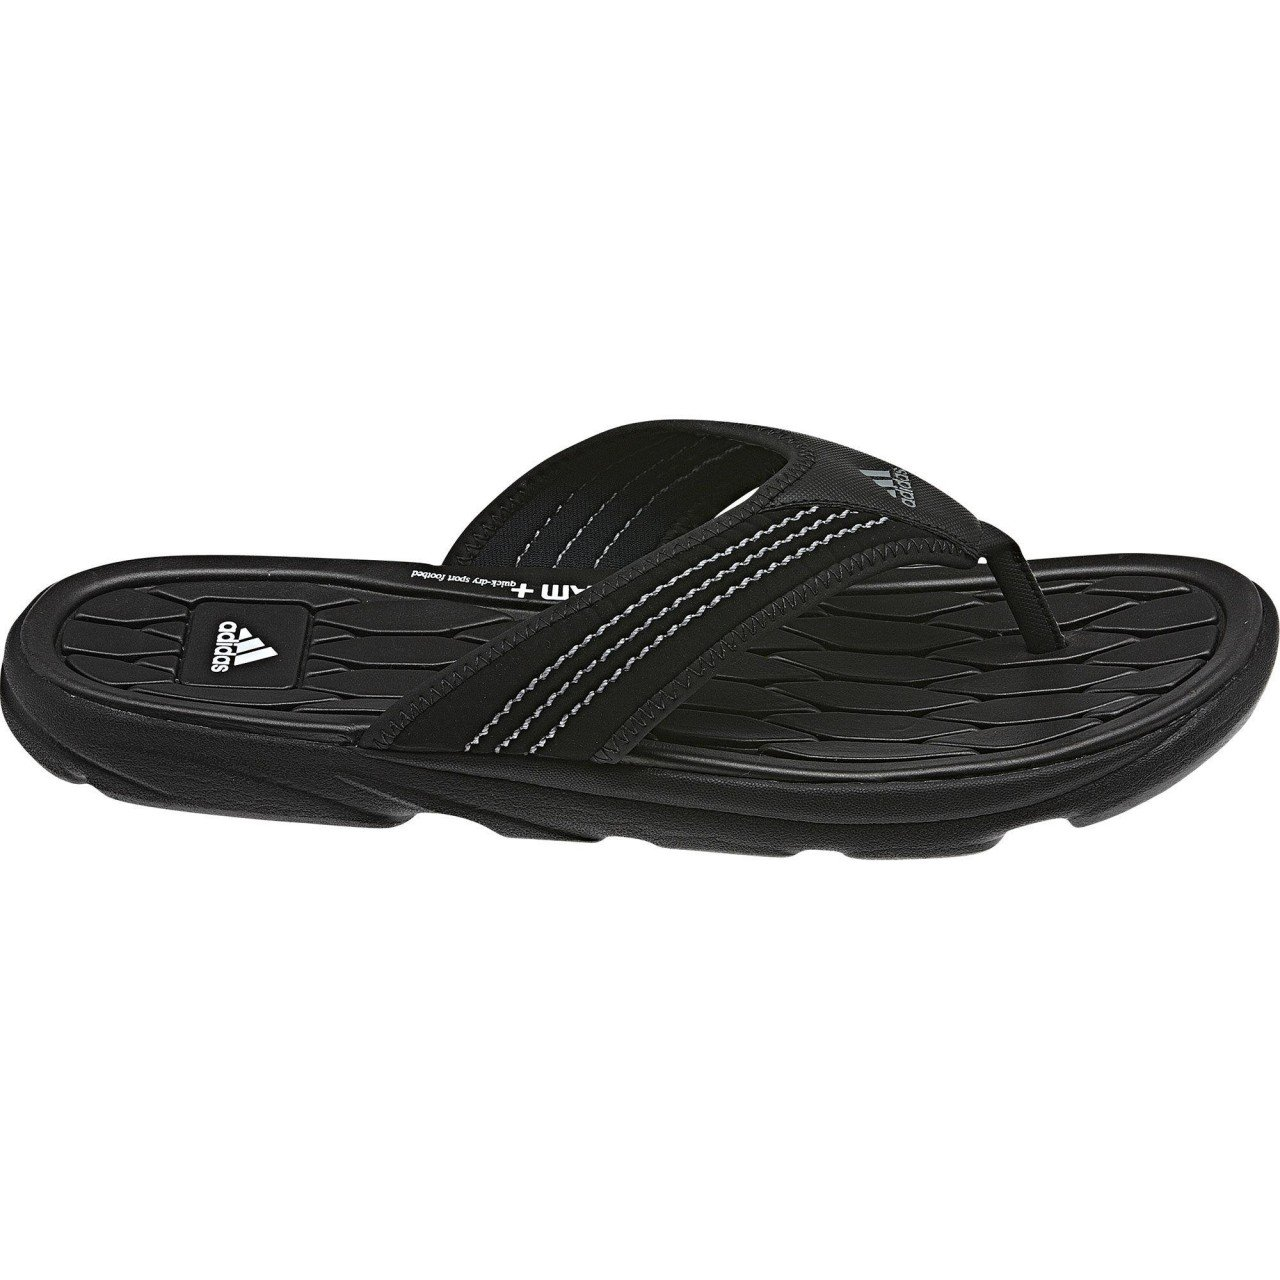 755142a28 adidas Sandals   Flip Flops - Men s Raggmo Thongs - Black - 6  Amazon.co.uk   Shoes   Bags